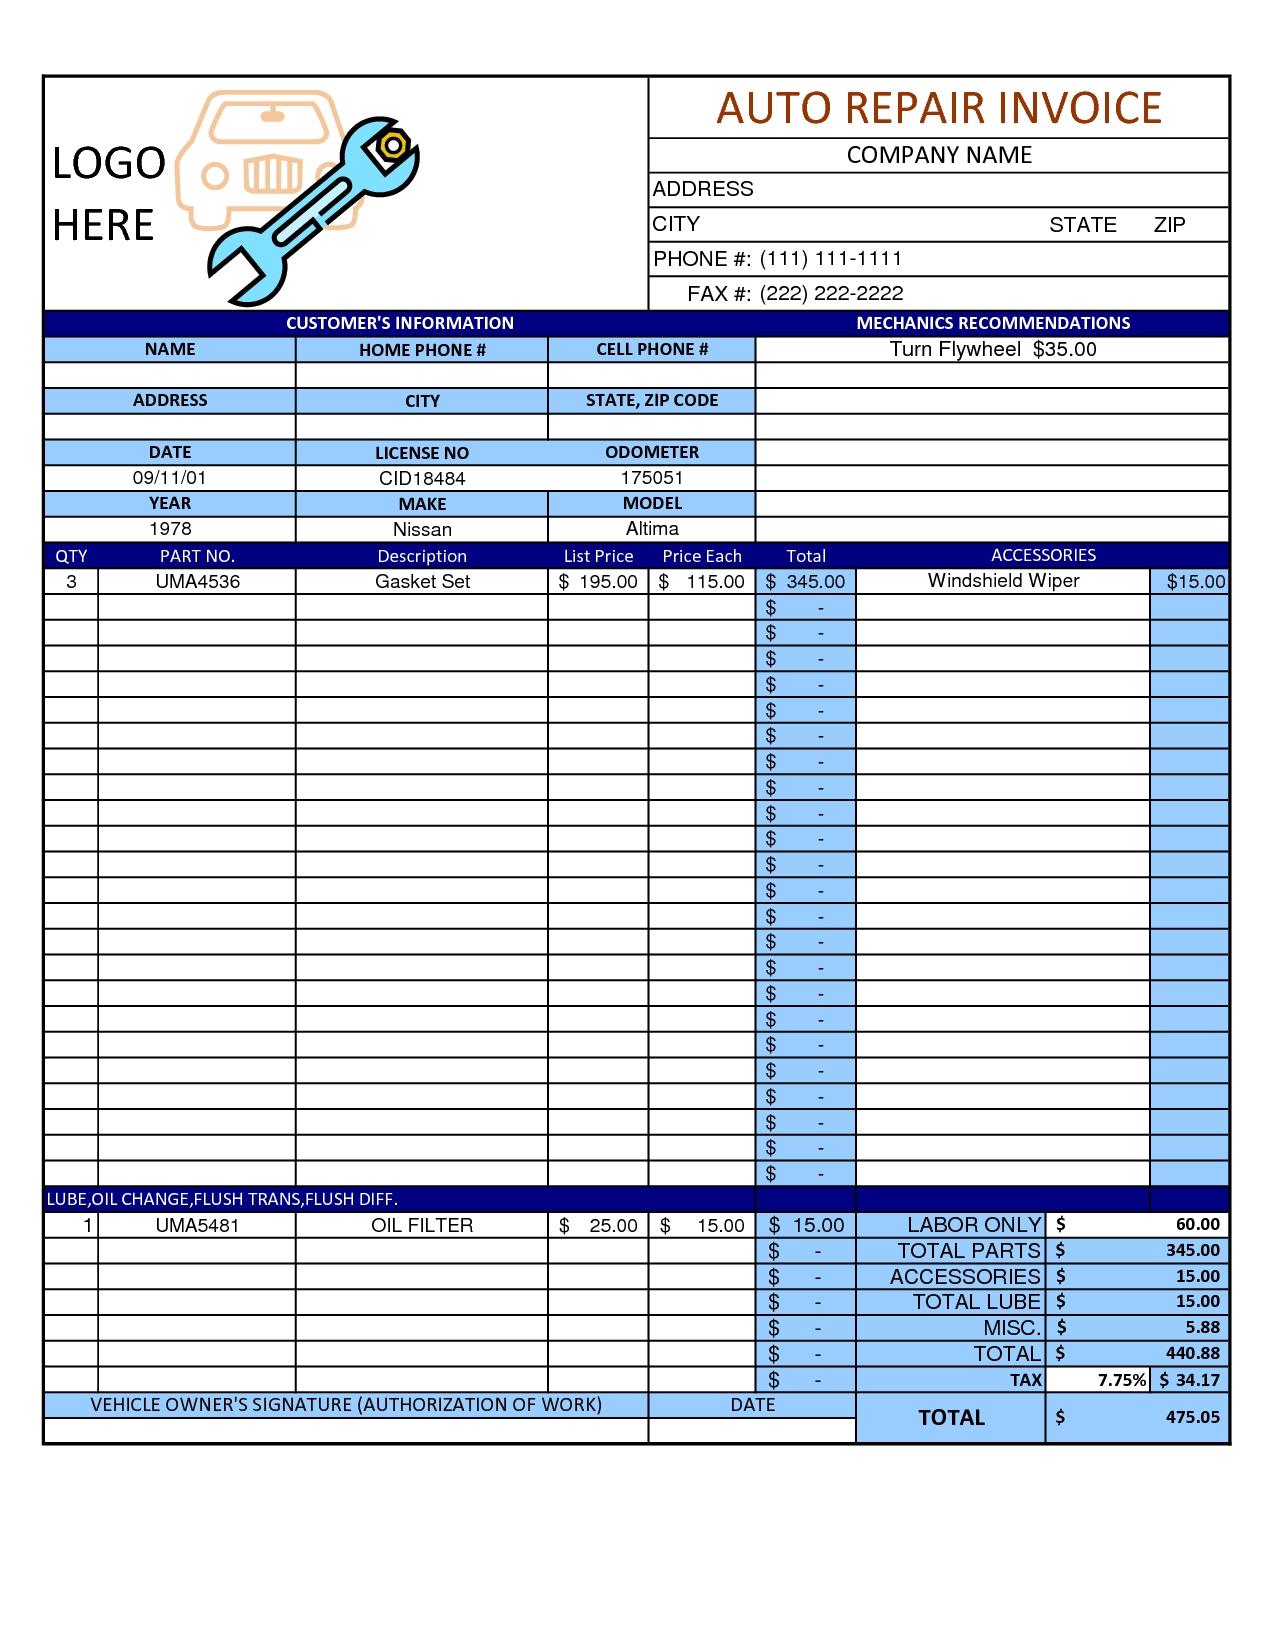 mechanic shop invoice scope of work template in 2019 mechanic shop invoice templates